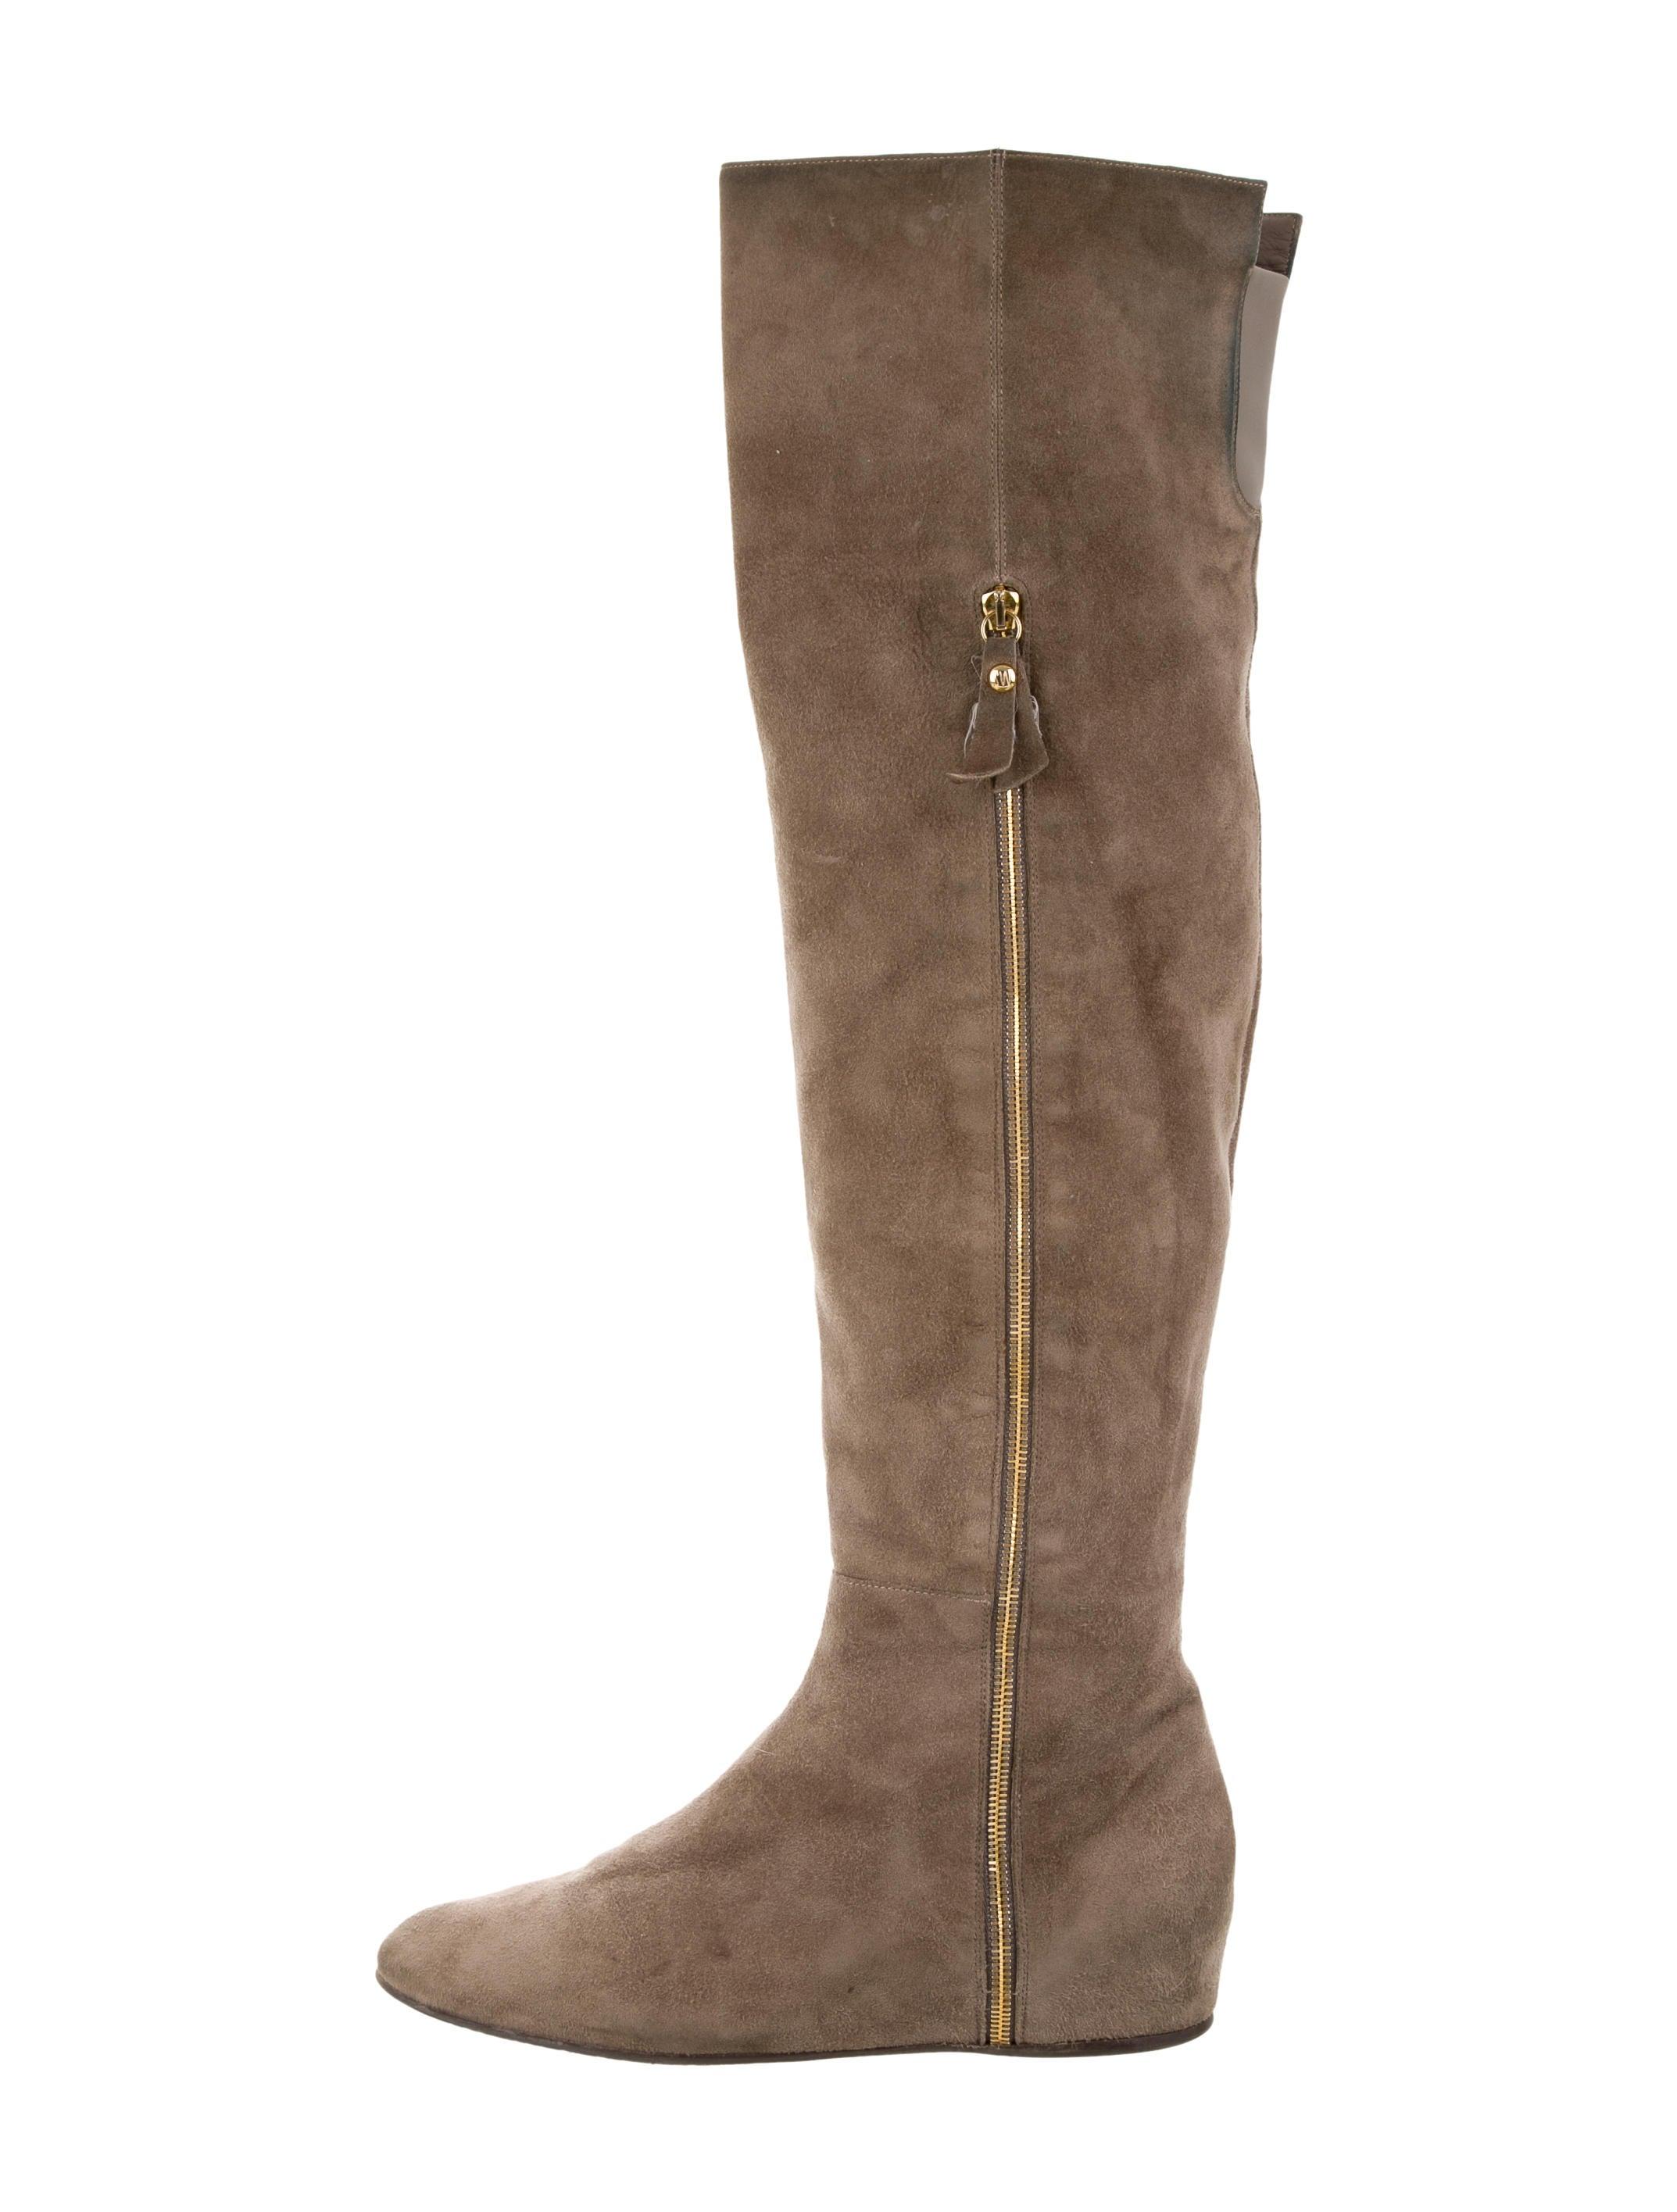 stuart weitzman the knee wedge boots shoes